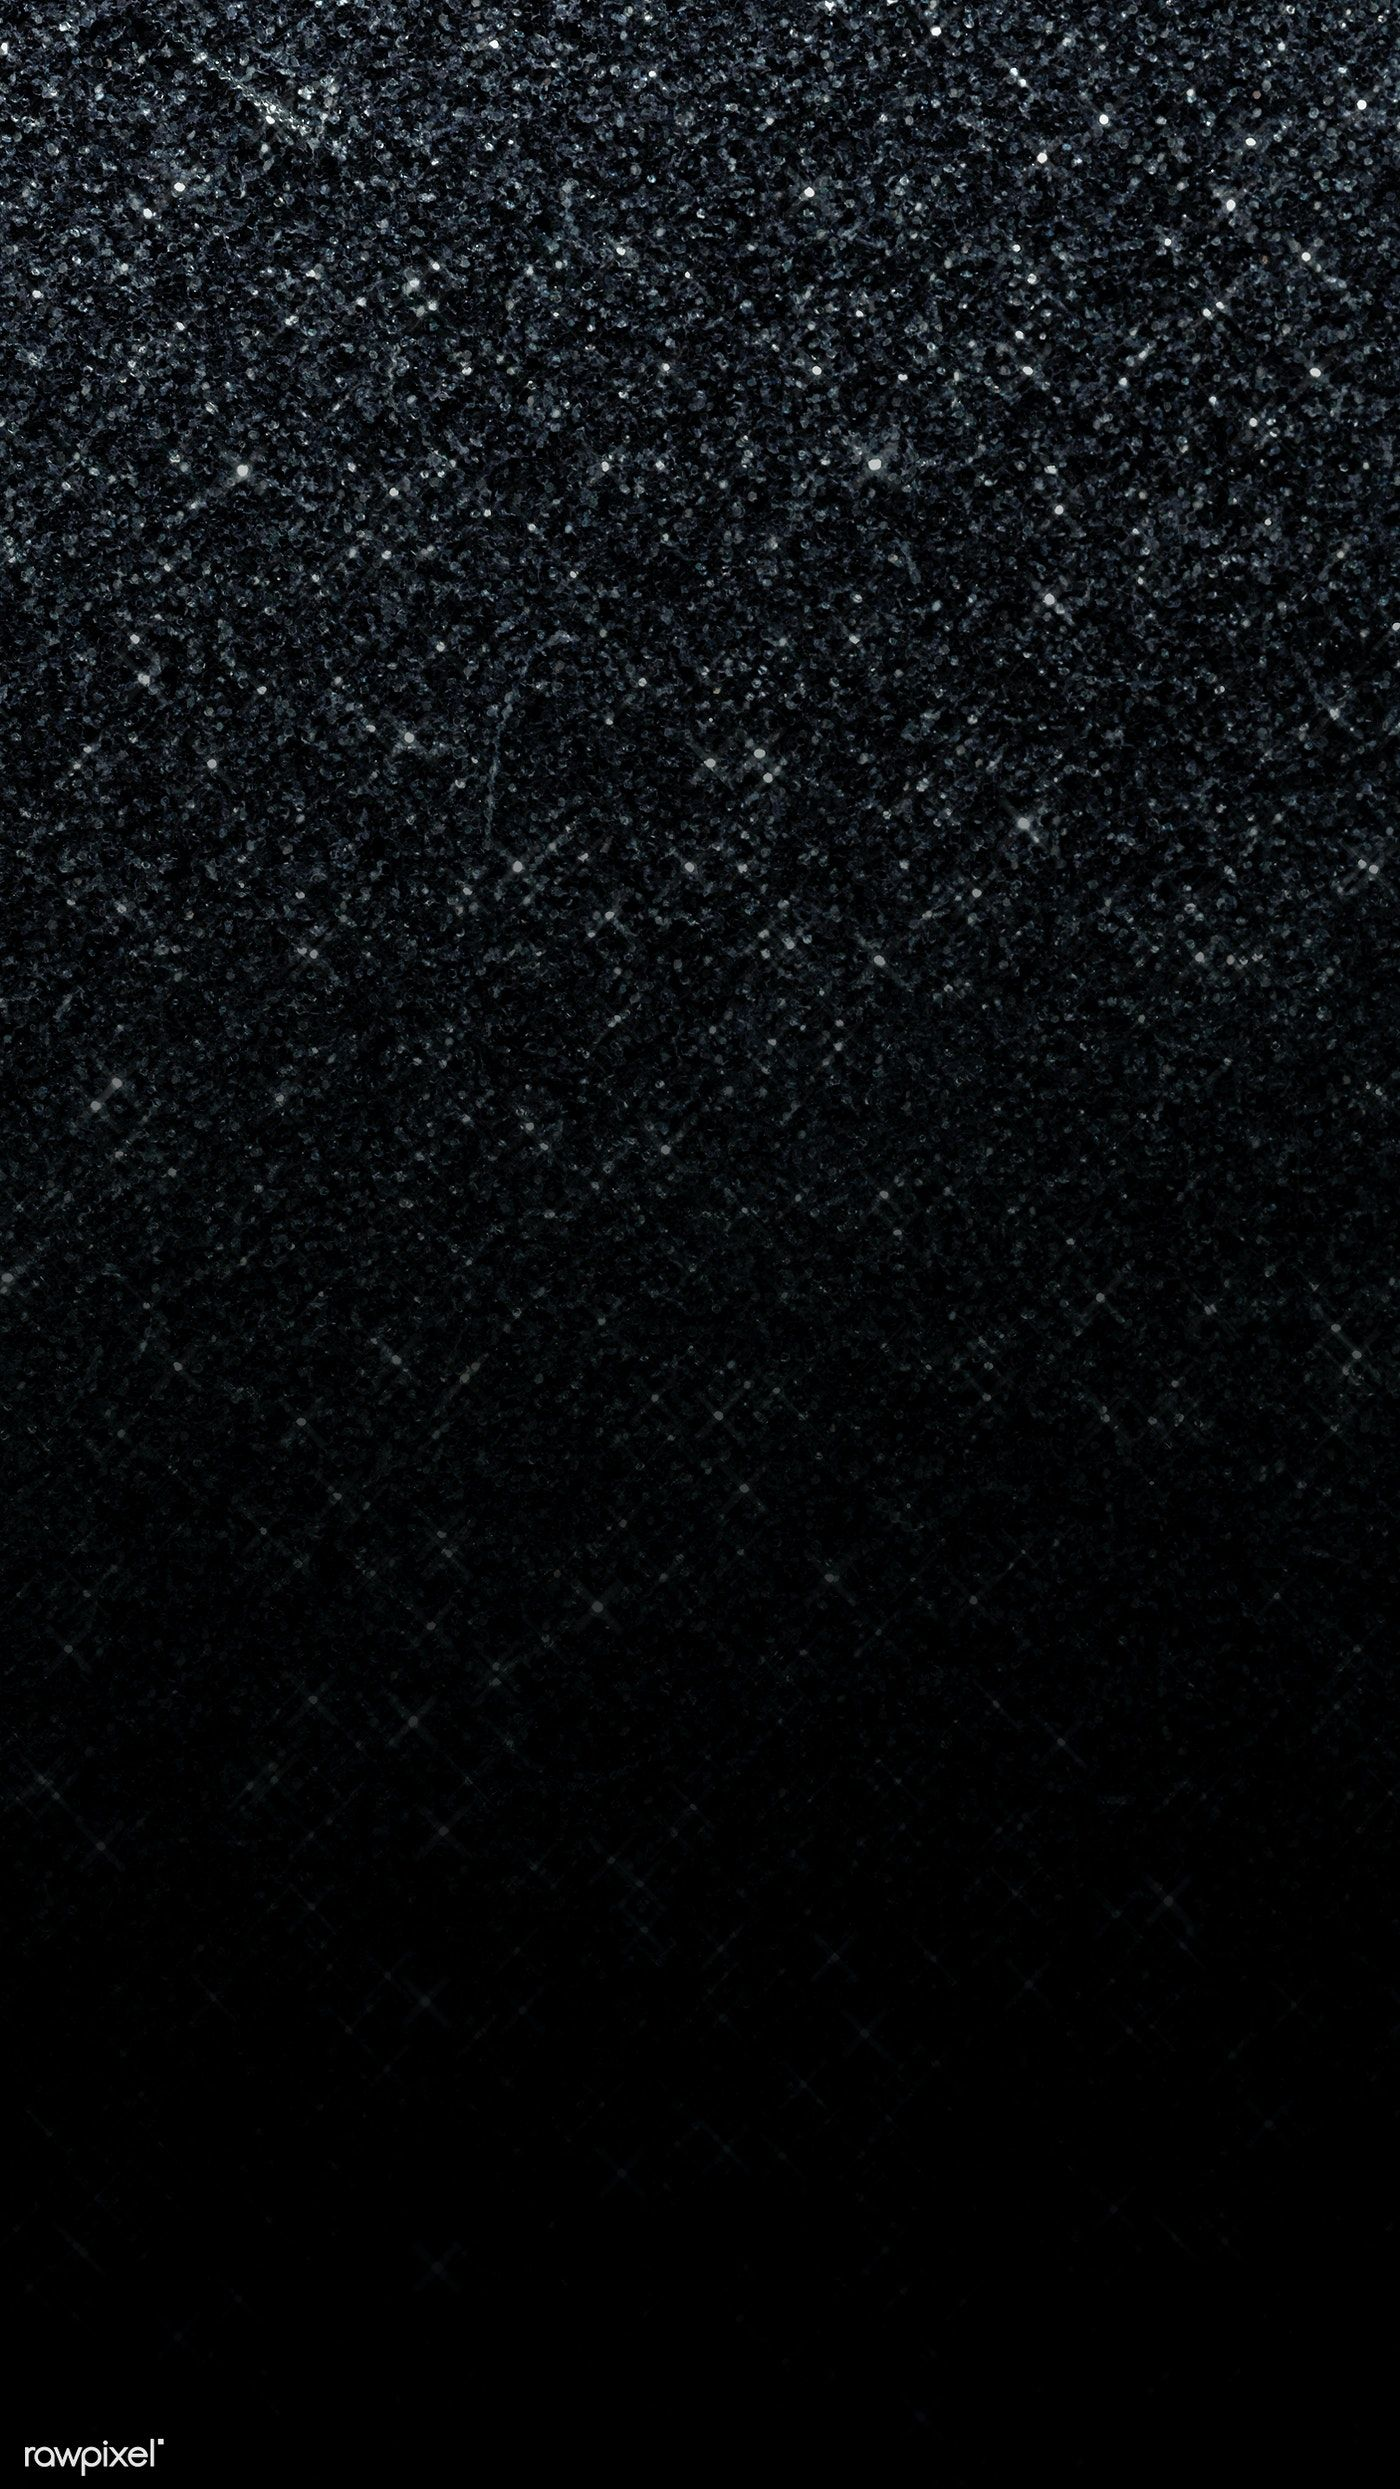 Download Premium Image Of Black Glittery Textured Mobile Wallpaper 2280977